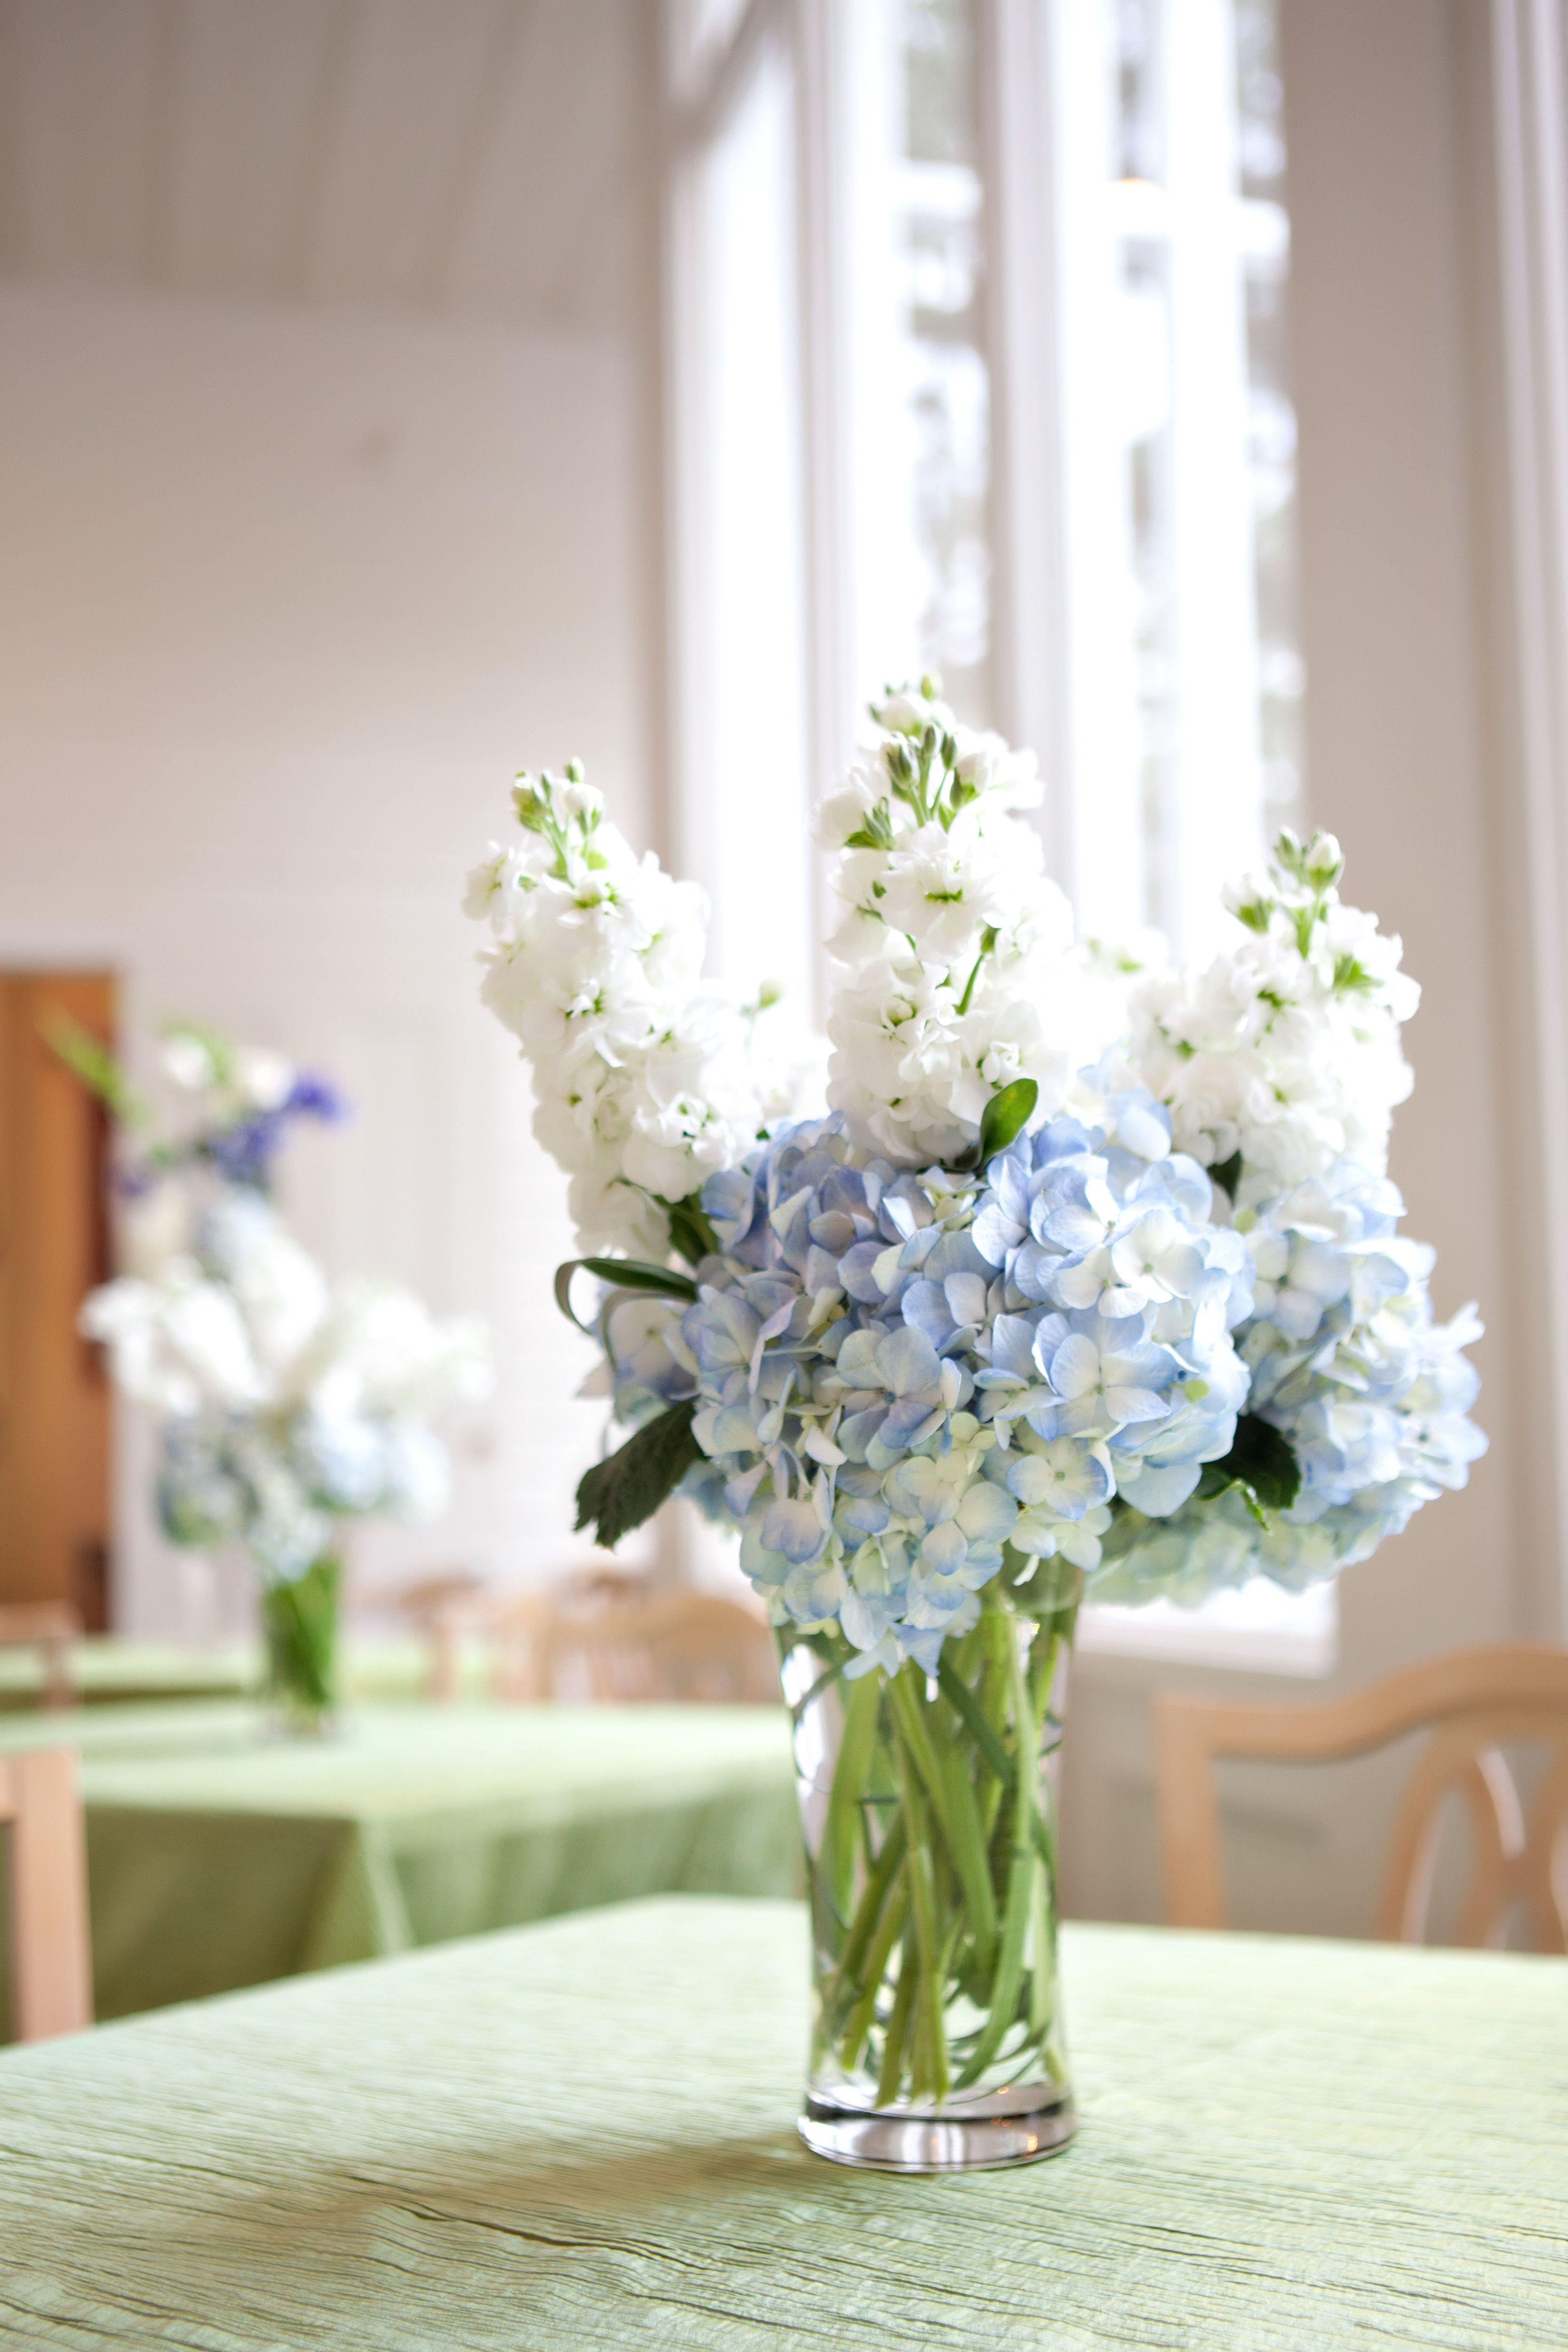 Hydrangea wedding flower arrangement Beautiful small centerpiece